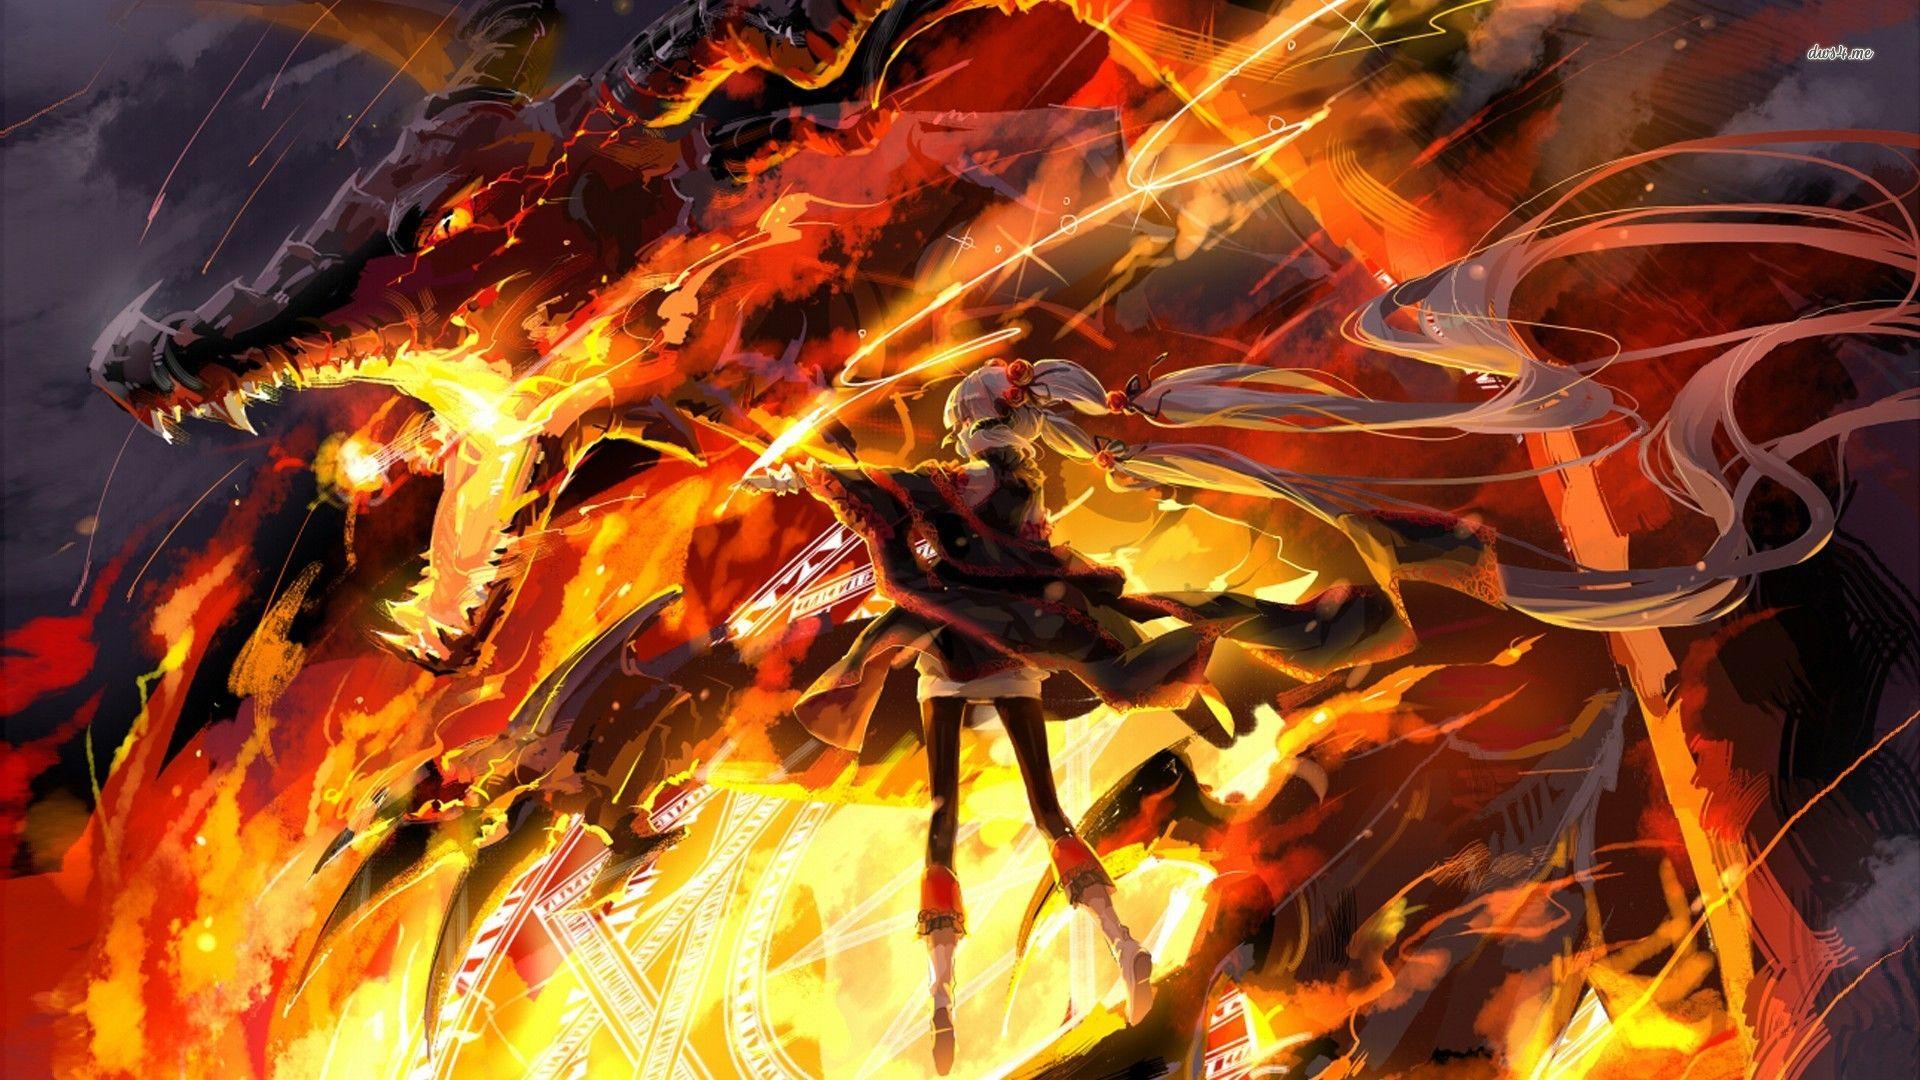 Dragons Fighting Wallpaper